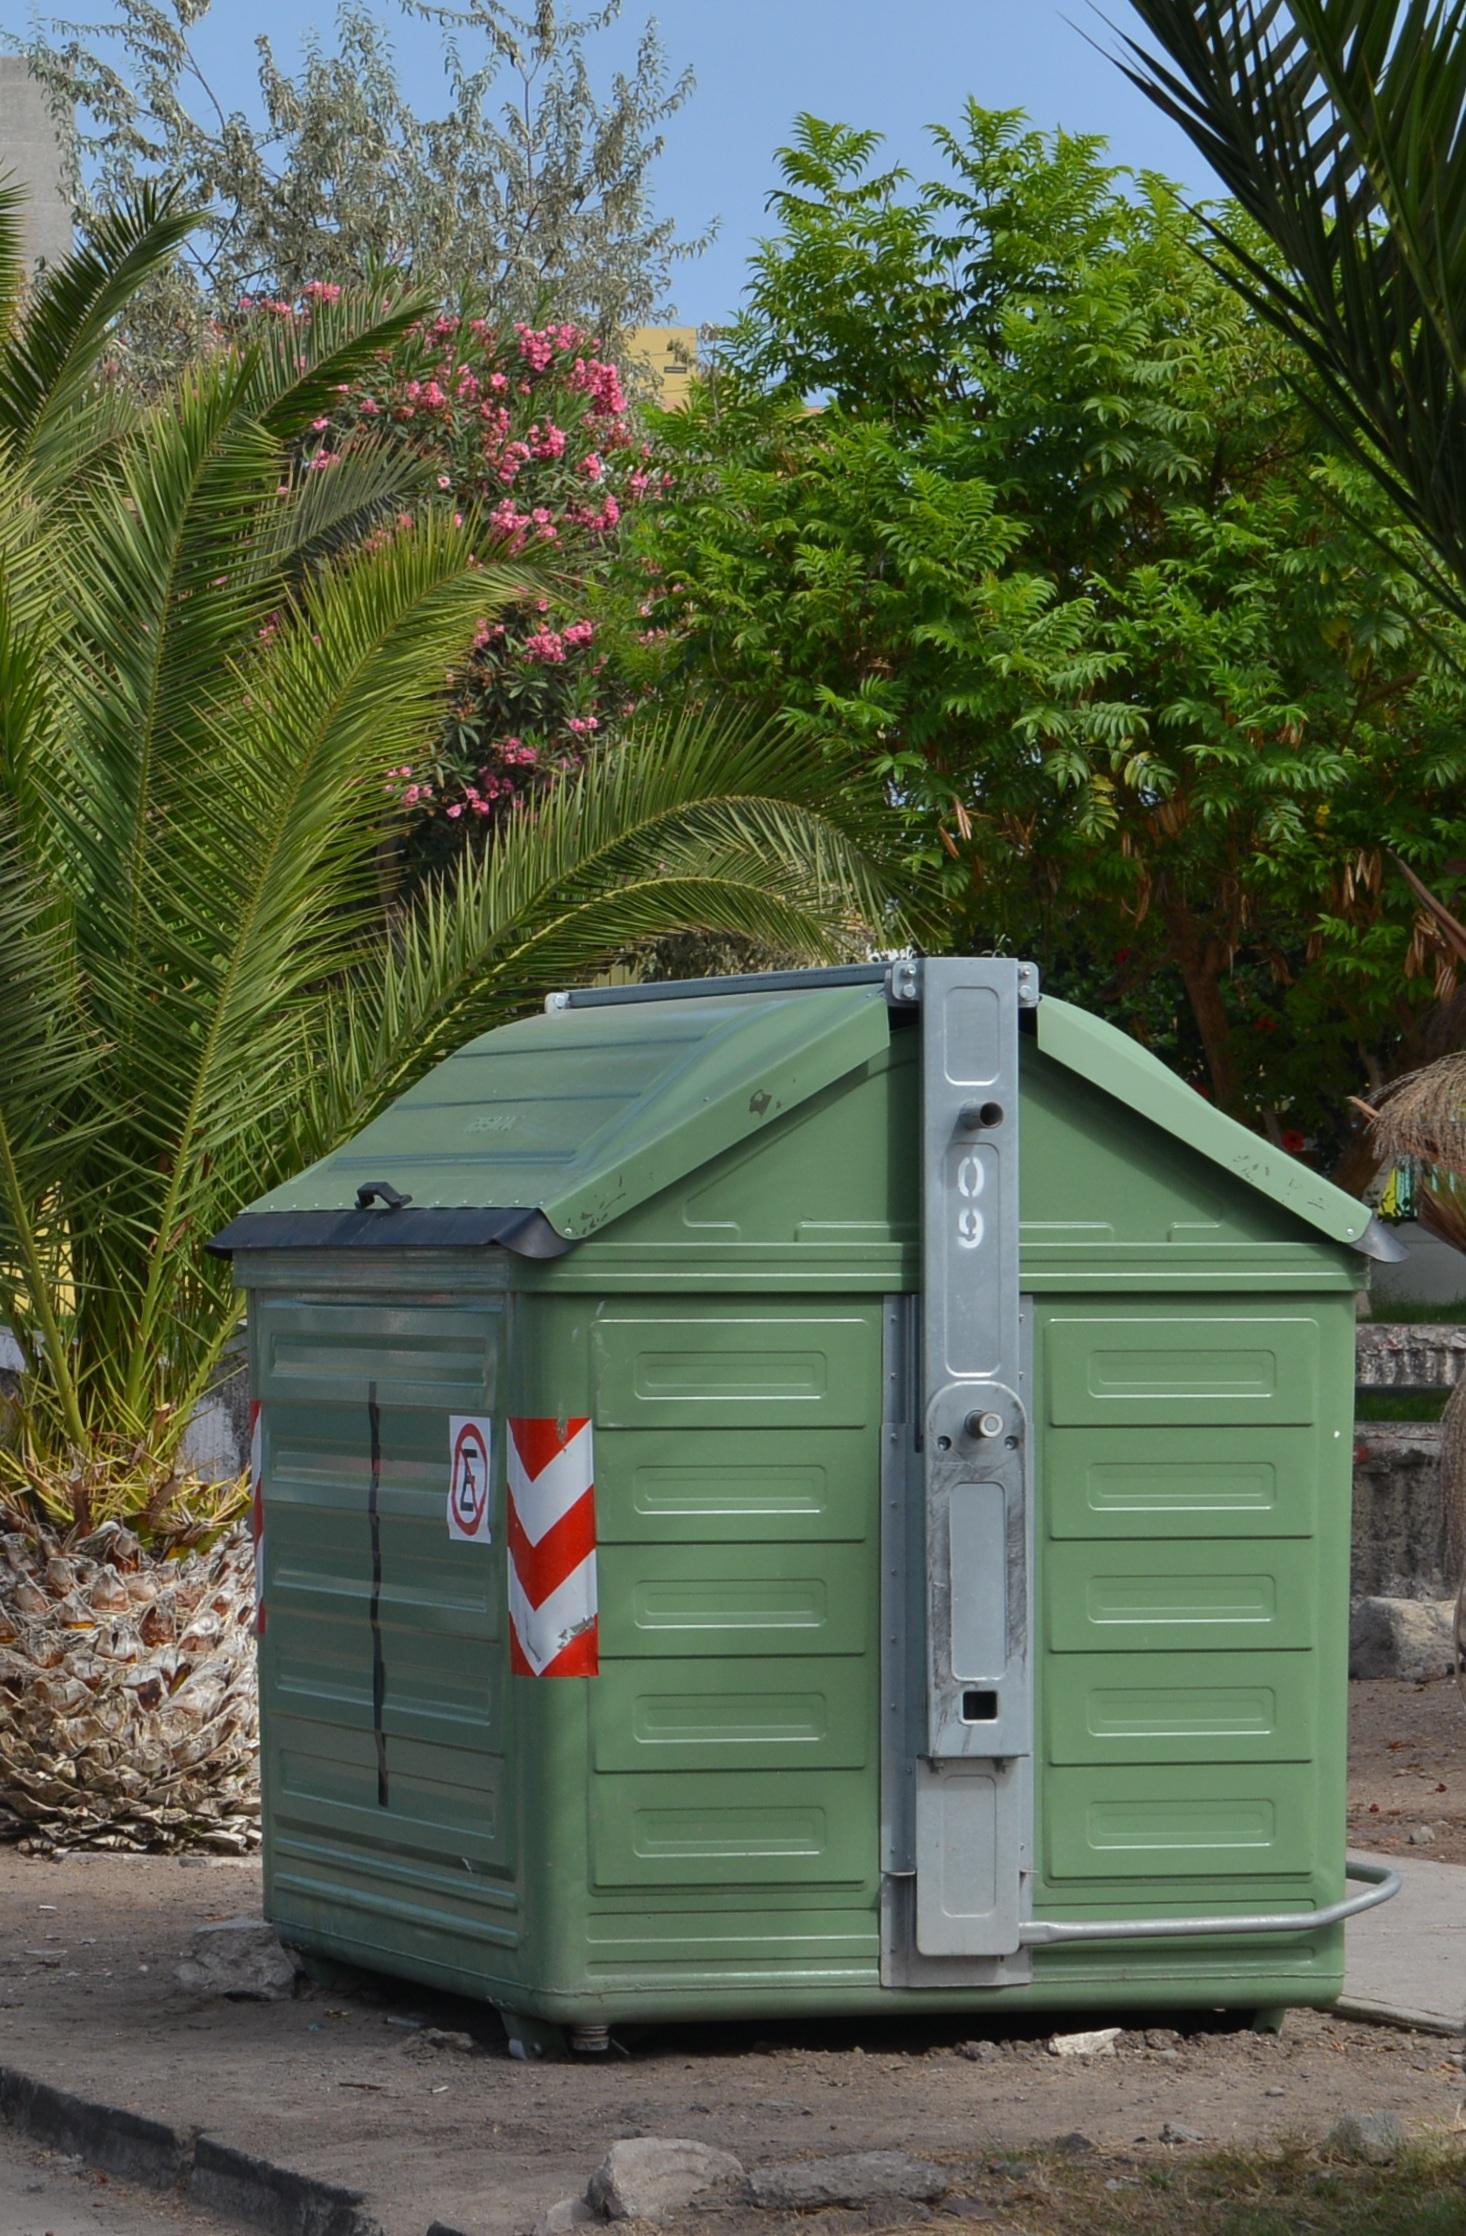 Municipio de iquique comprar medio millar de contenedores for Objetivo de bano de basura